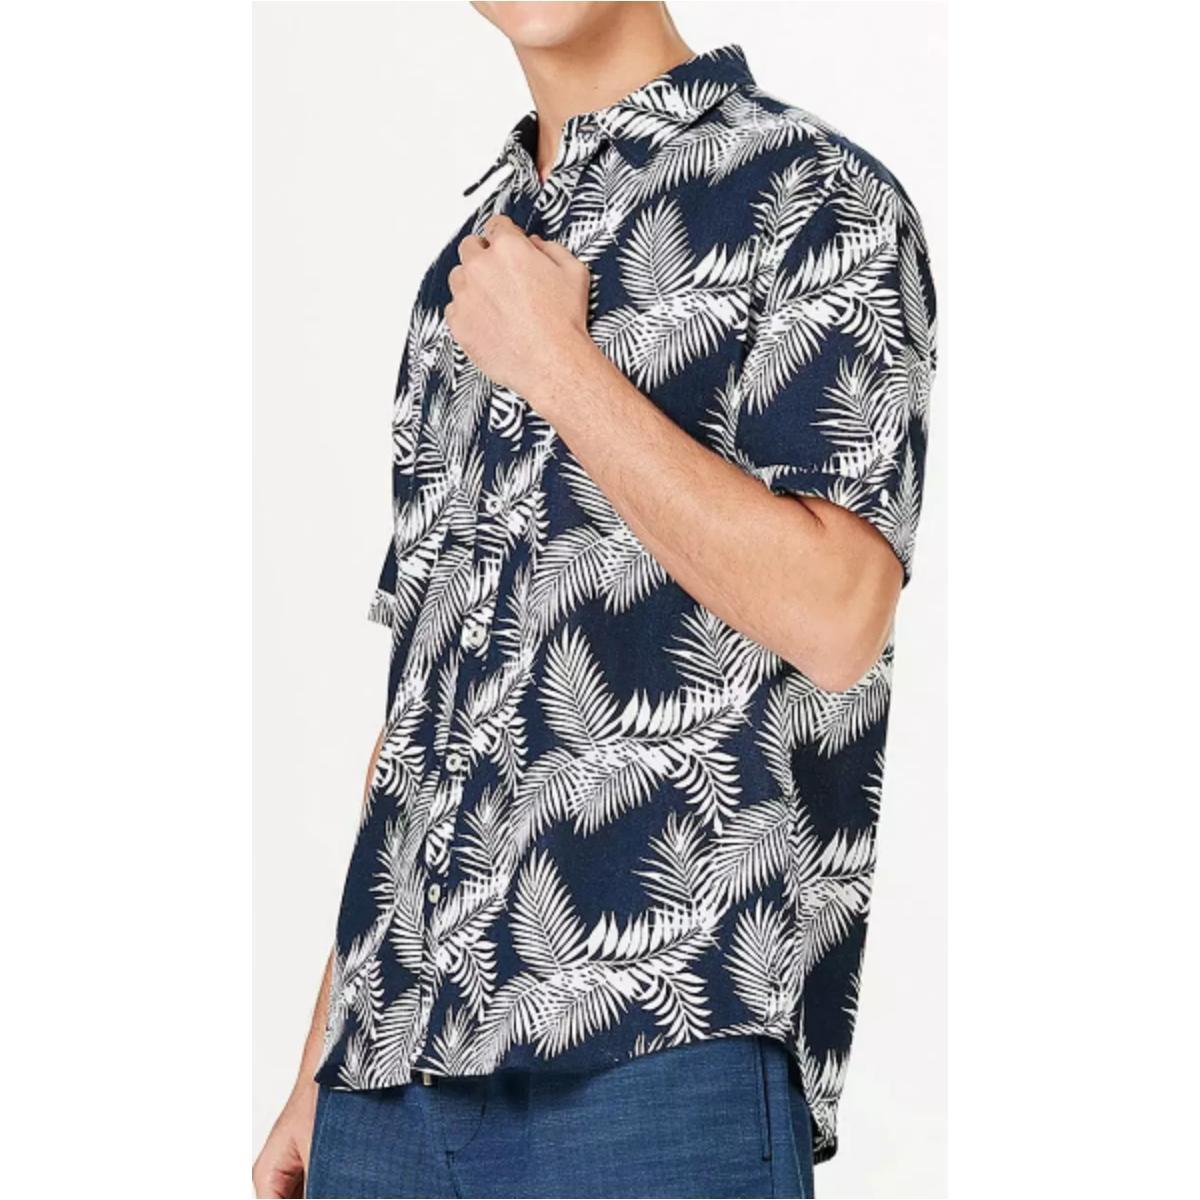 Camisa Masculina Hering Ktz1 1bsi Marinho/branco